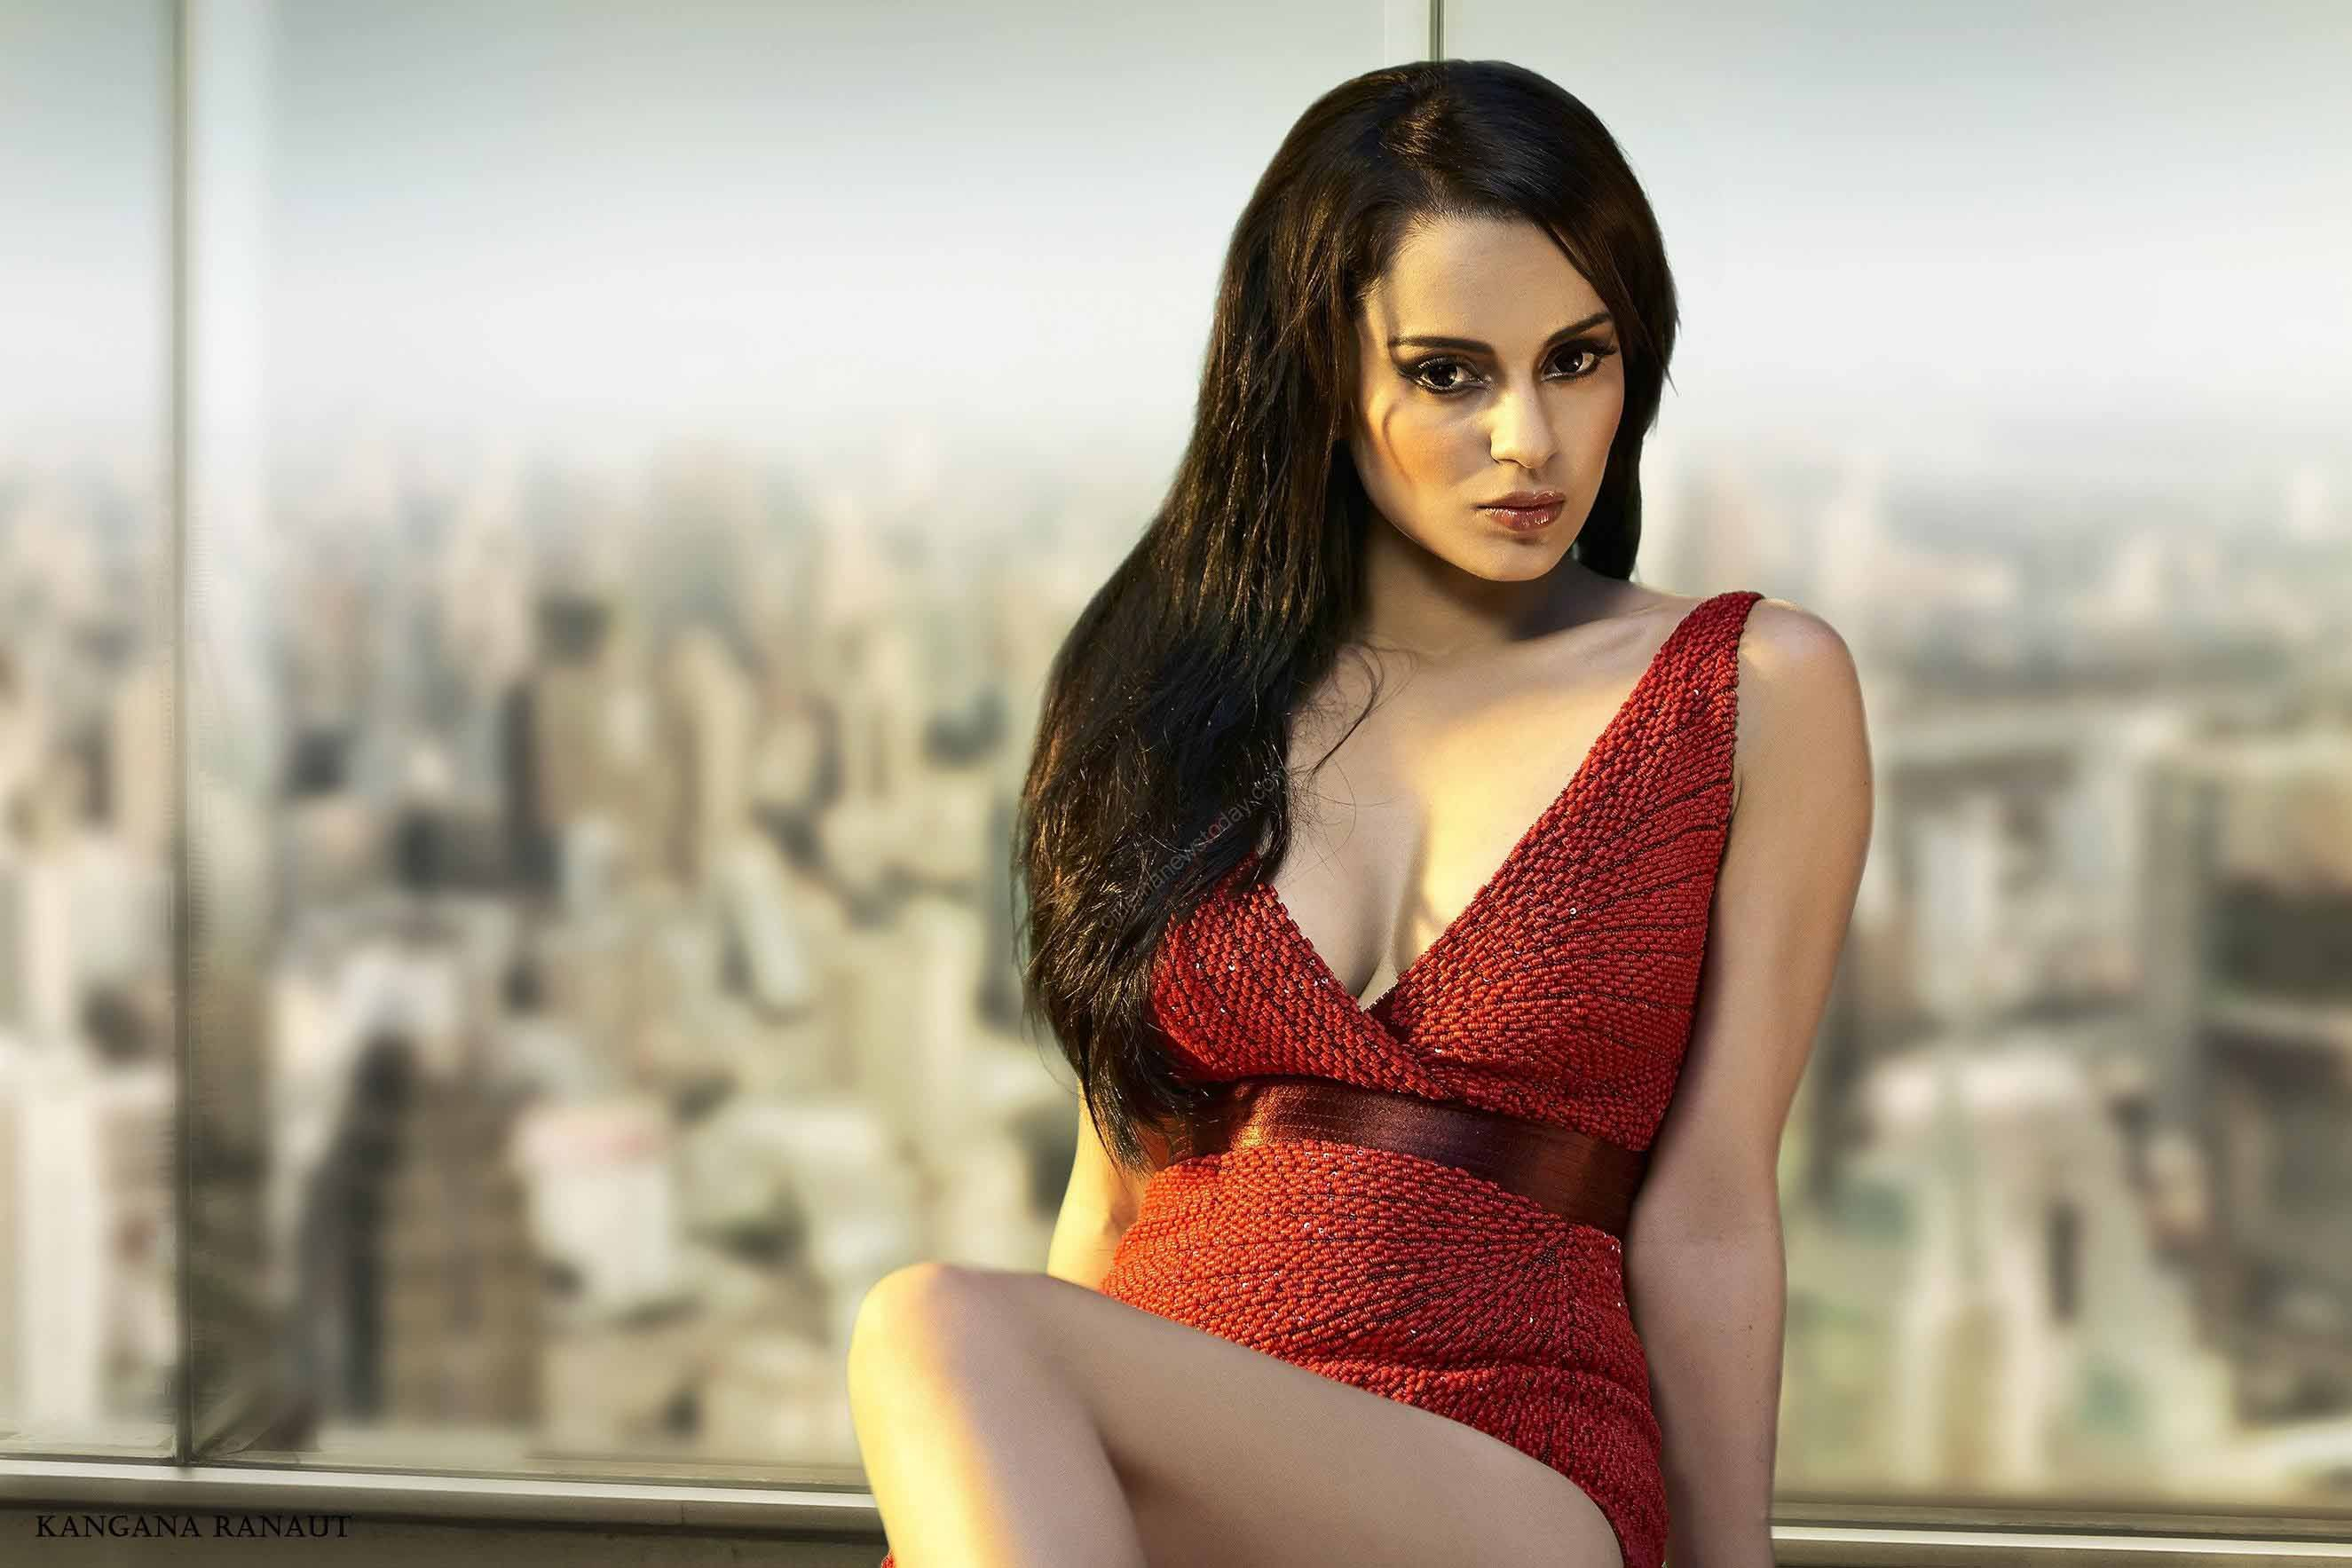 urvashi rautela bikini photoshoot hd wallpapers hot unseen images